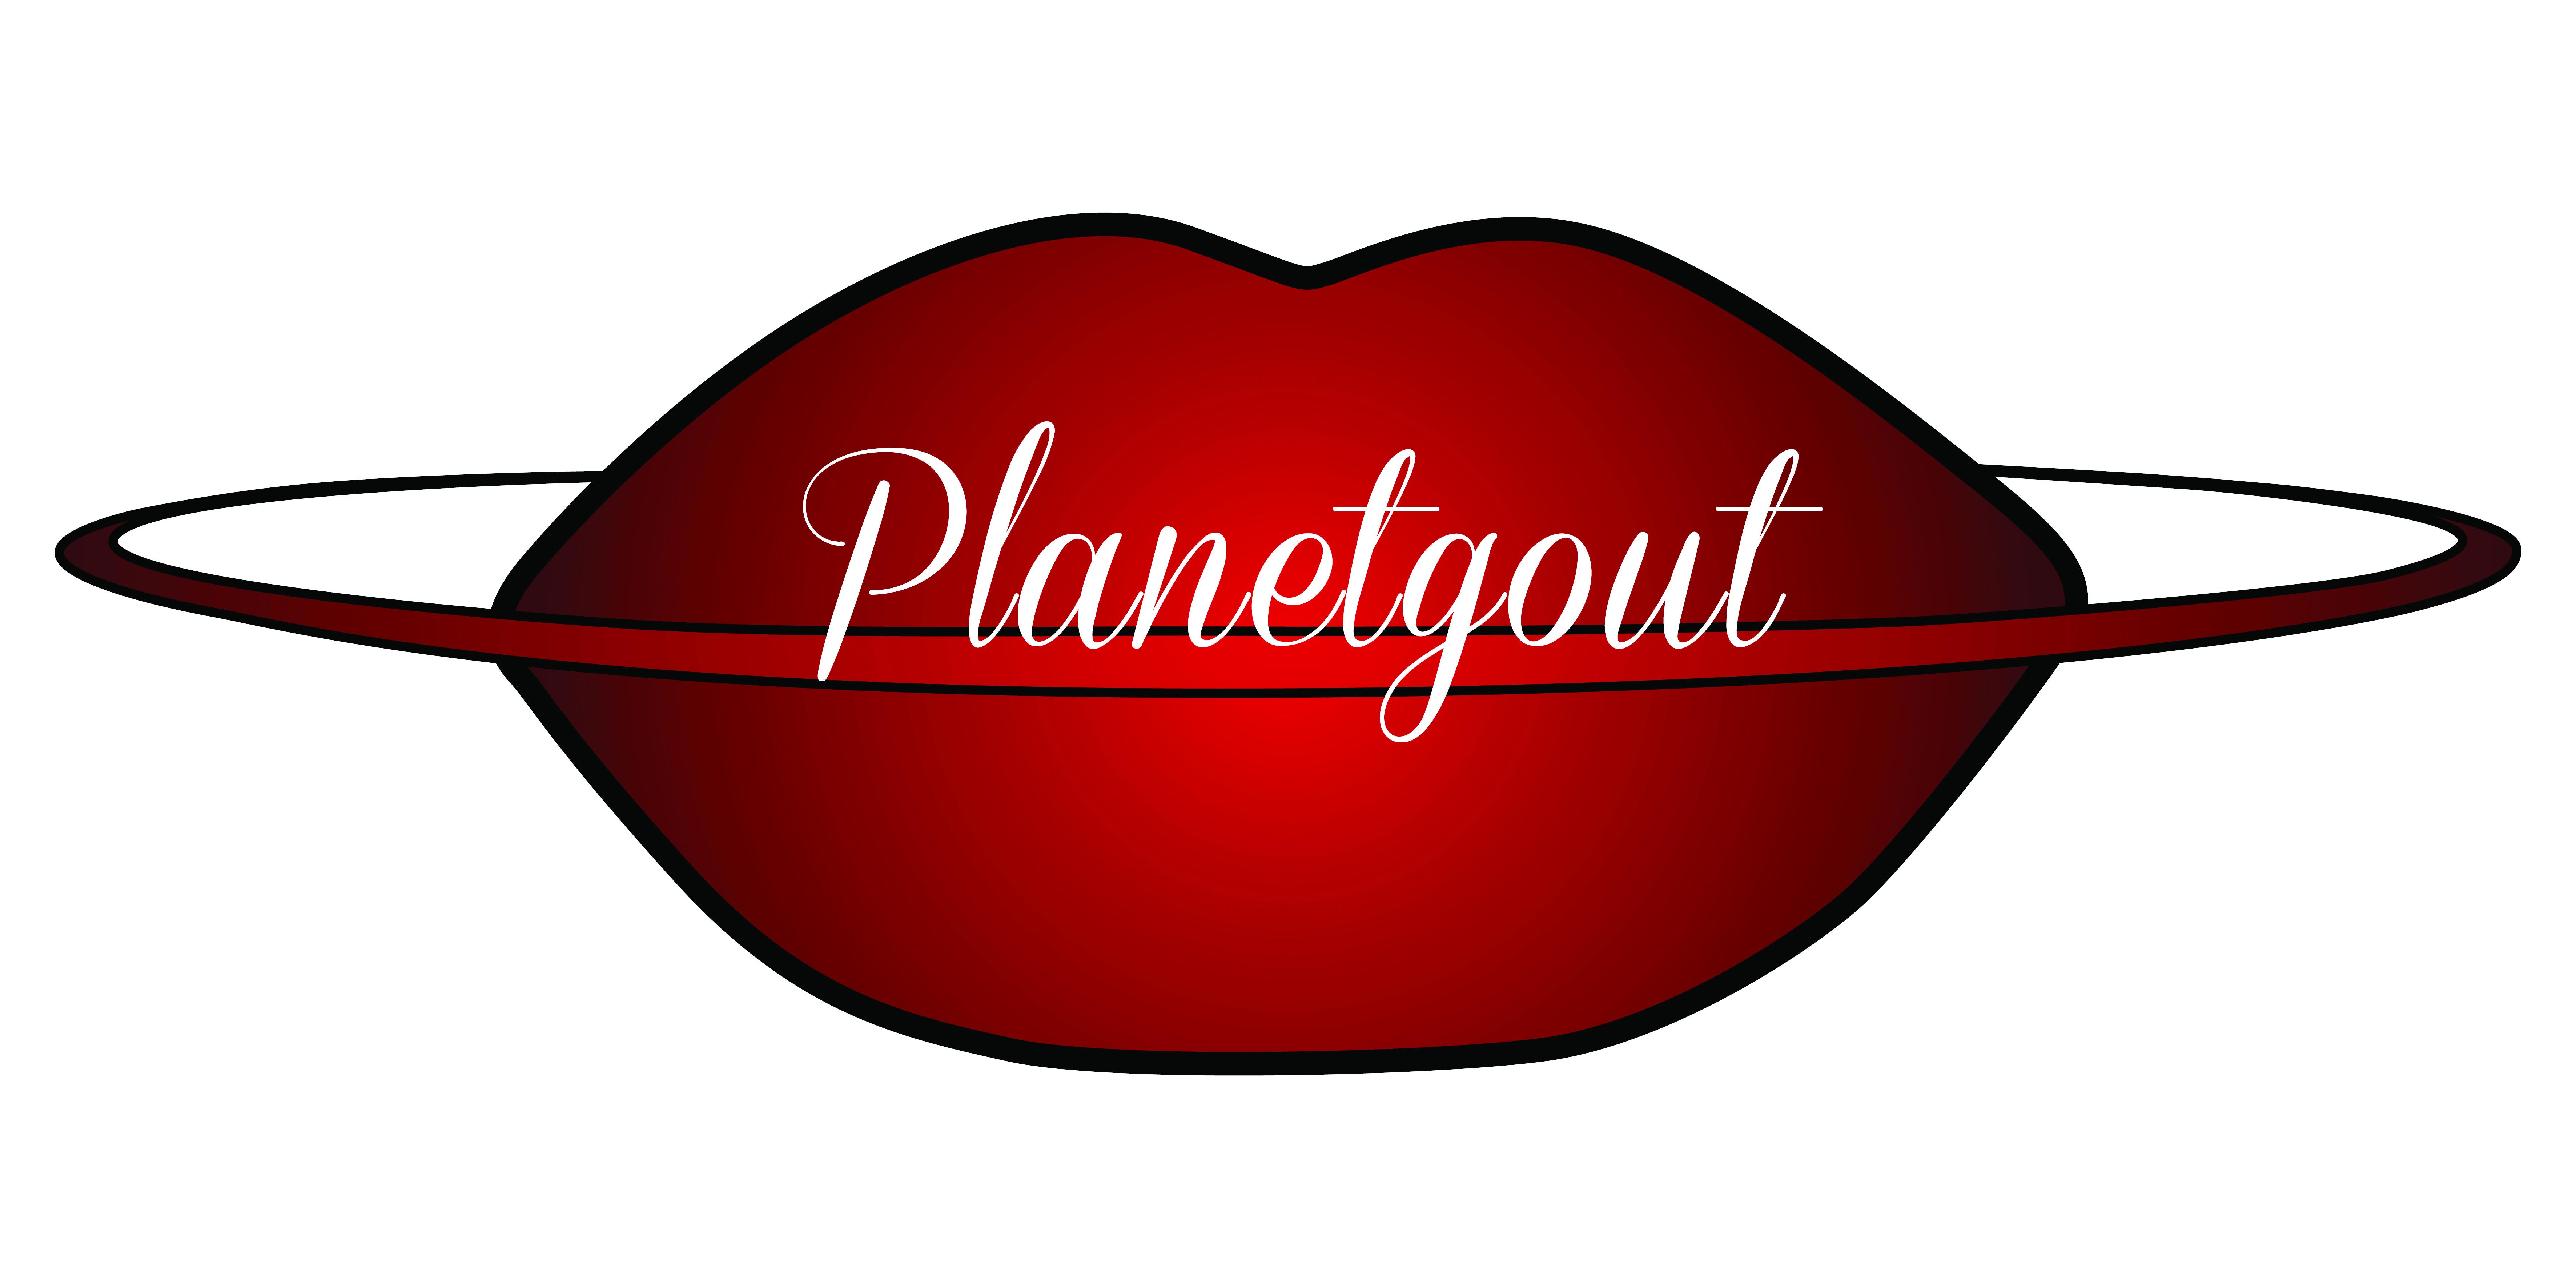 Logo planetgout en cmjn